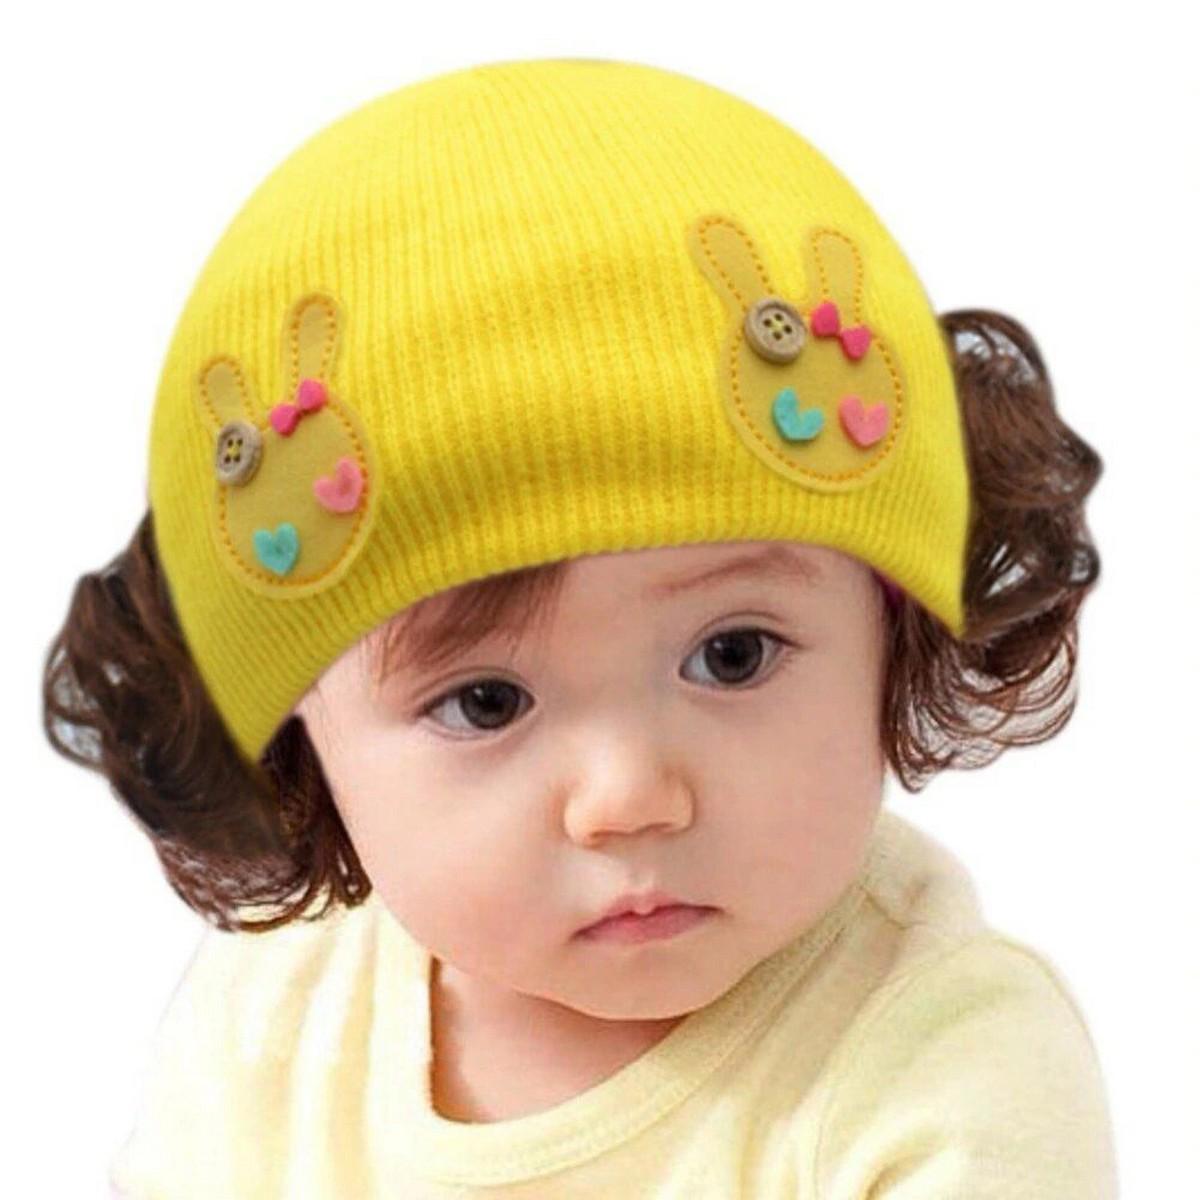 Little Kiddy Knitted Winter Hat for Unisex Warm Cap